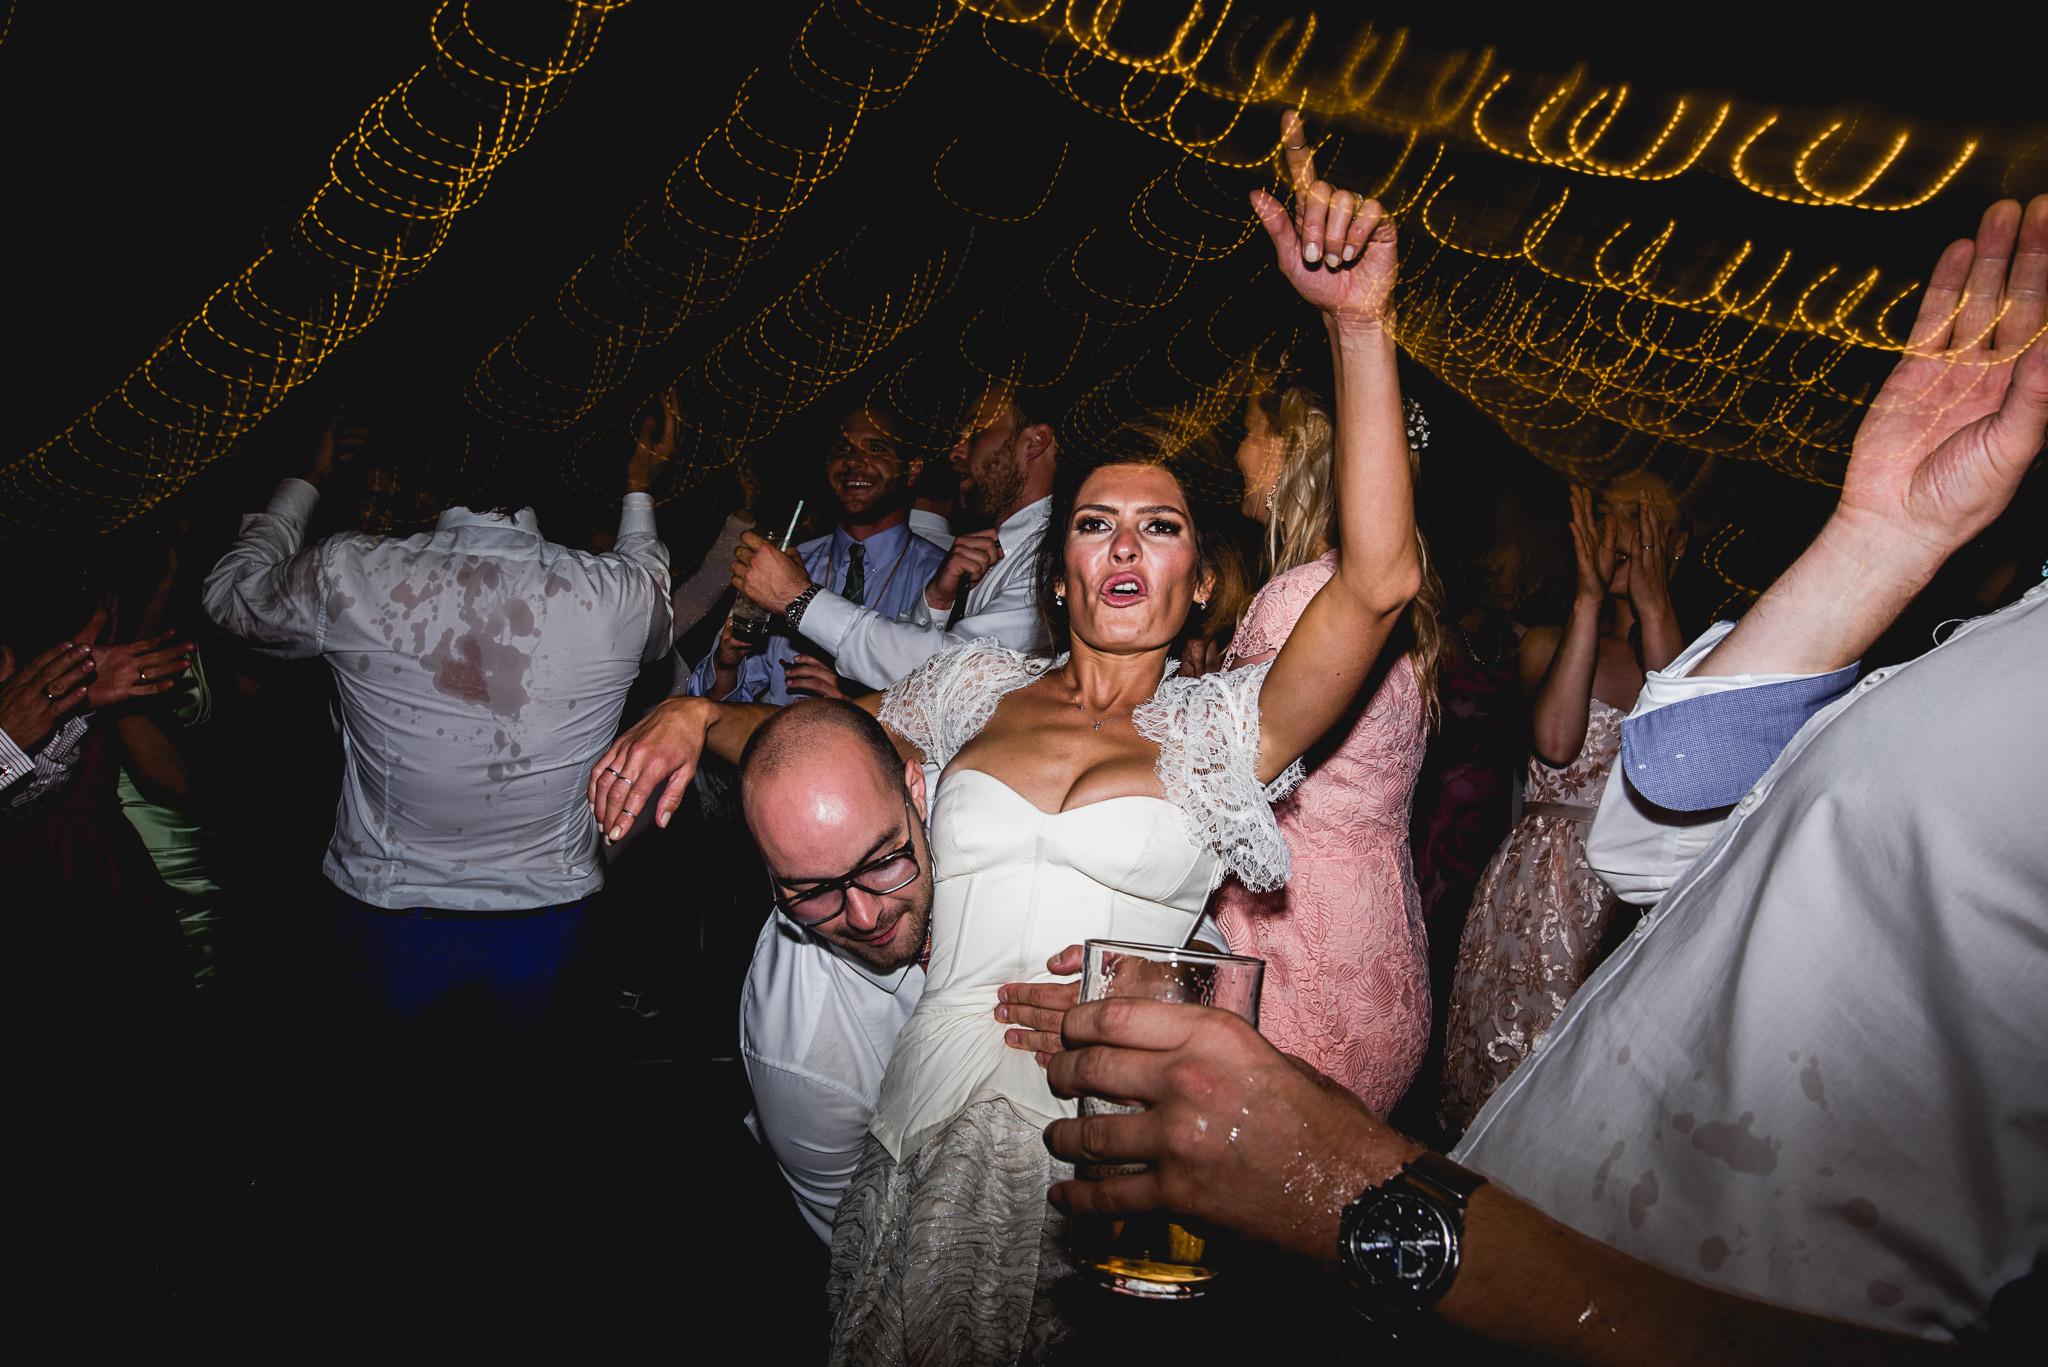 Lara & Jack Wedding 220815 by Barney Walters_1073_BW2_1180